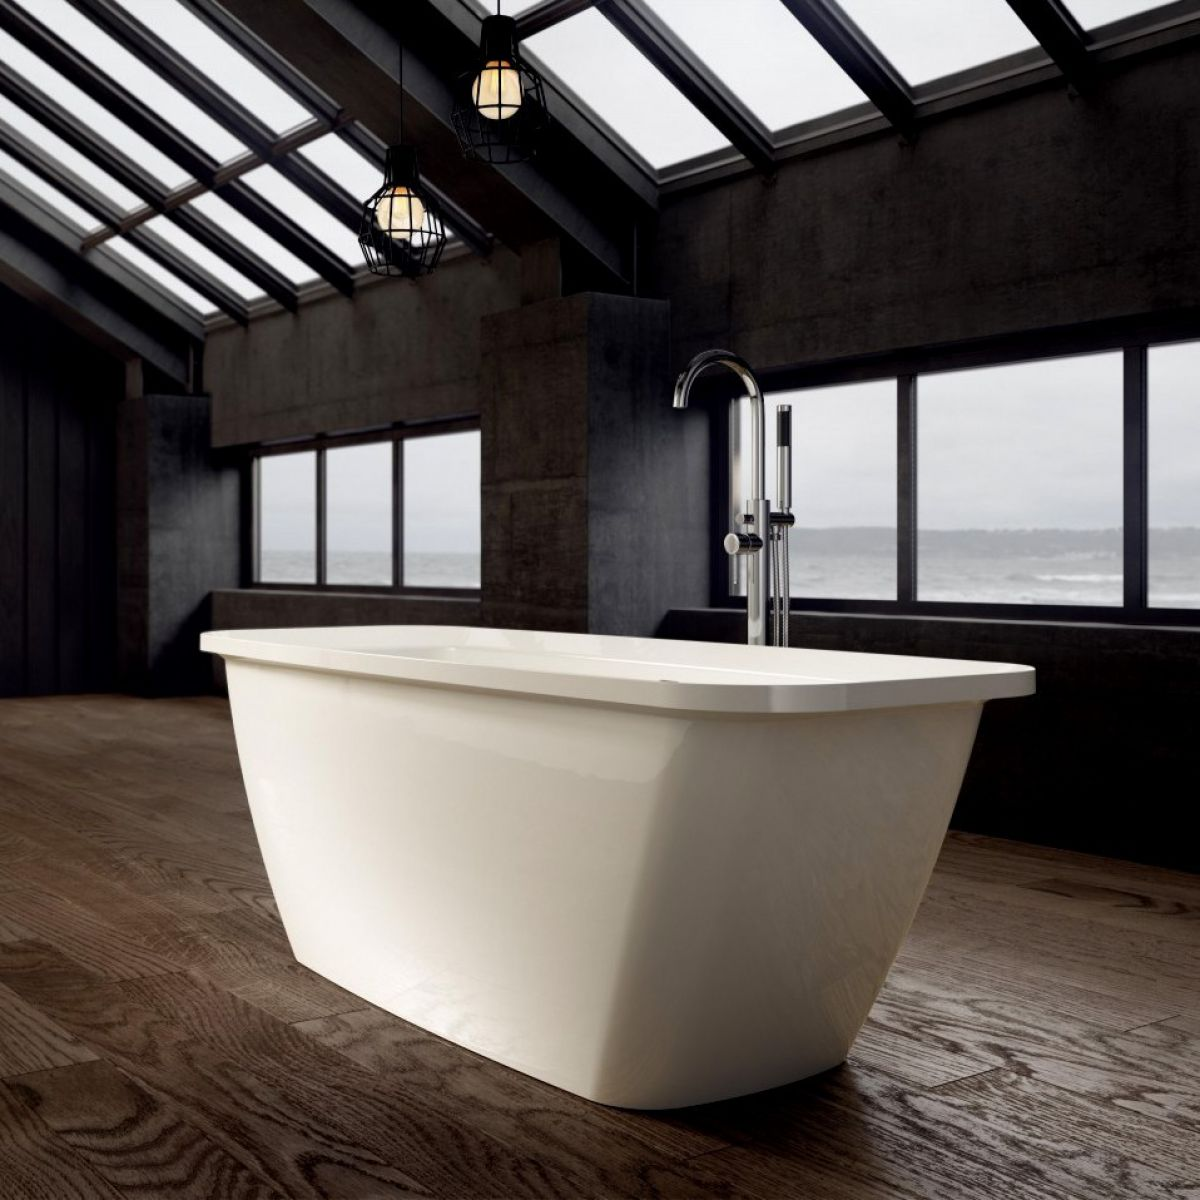 Ramsden & Mosley Orkney Modern Freestanding Bath : UK Bathrooms